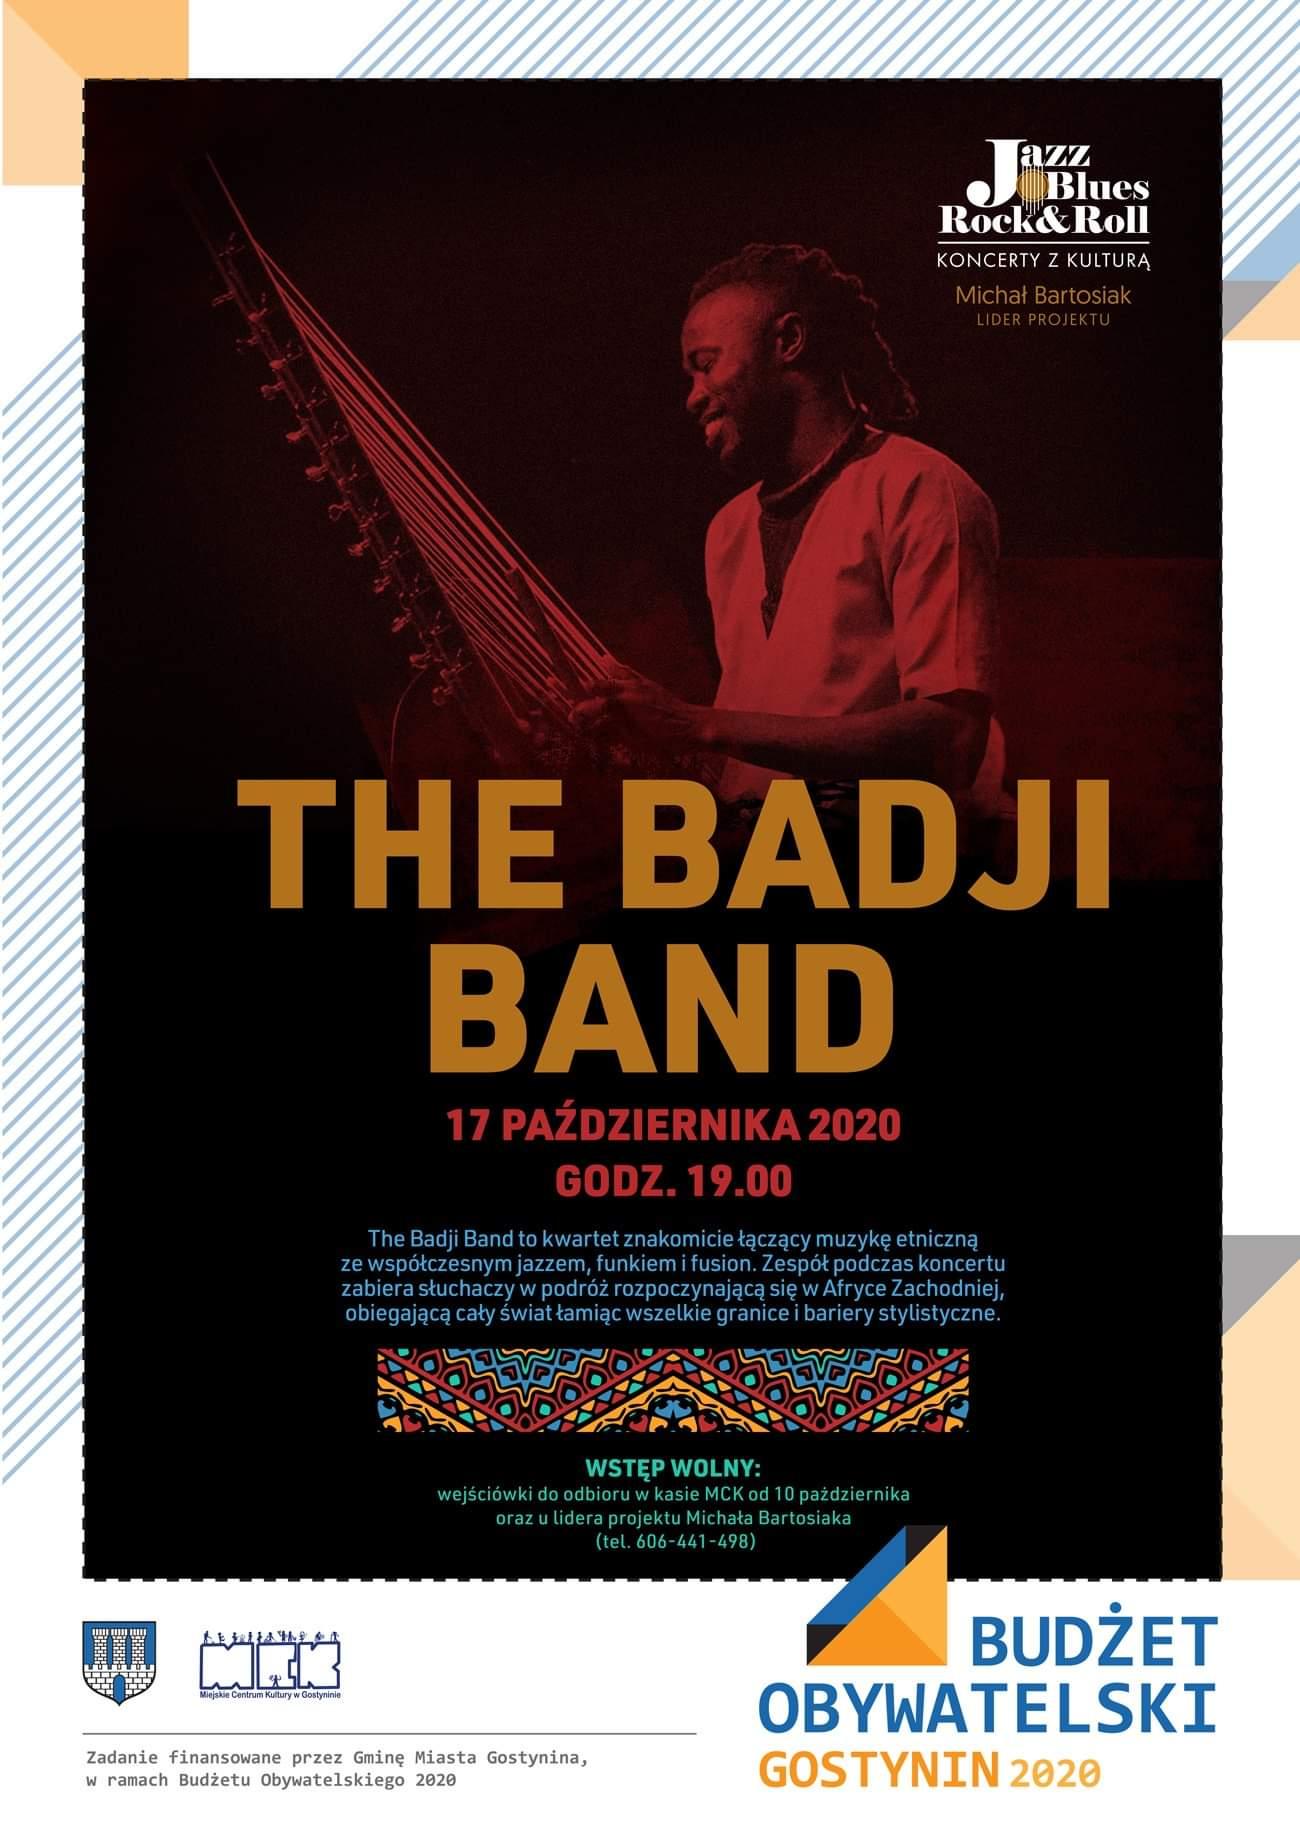 Koncert THE BADJI BAND – zapraszamy!